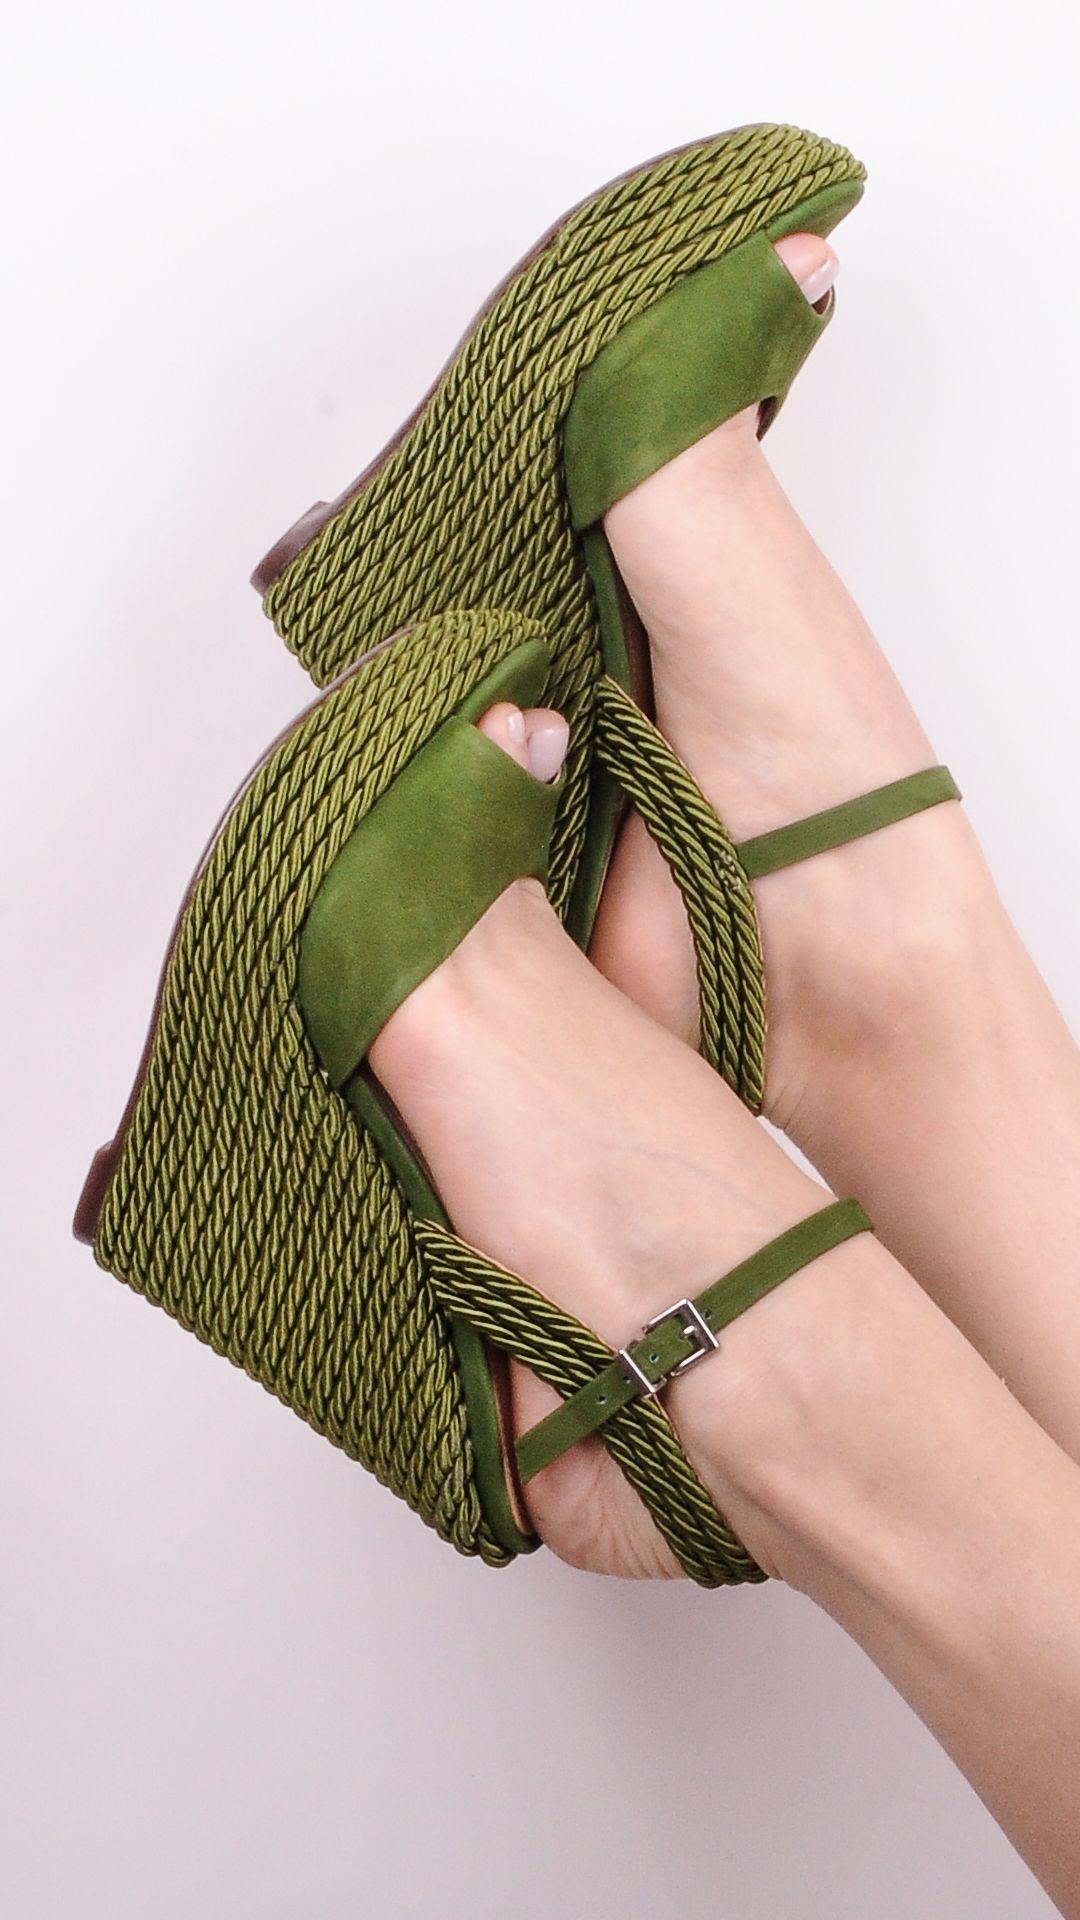 df1b14f17 Pin de SAPANET em New In Schutz! | Shoes, Espadrilles e Wedges